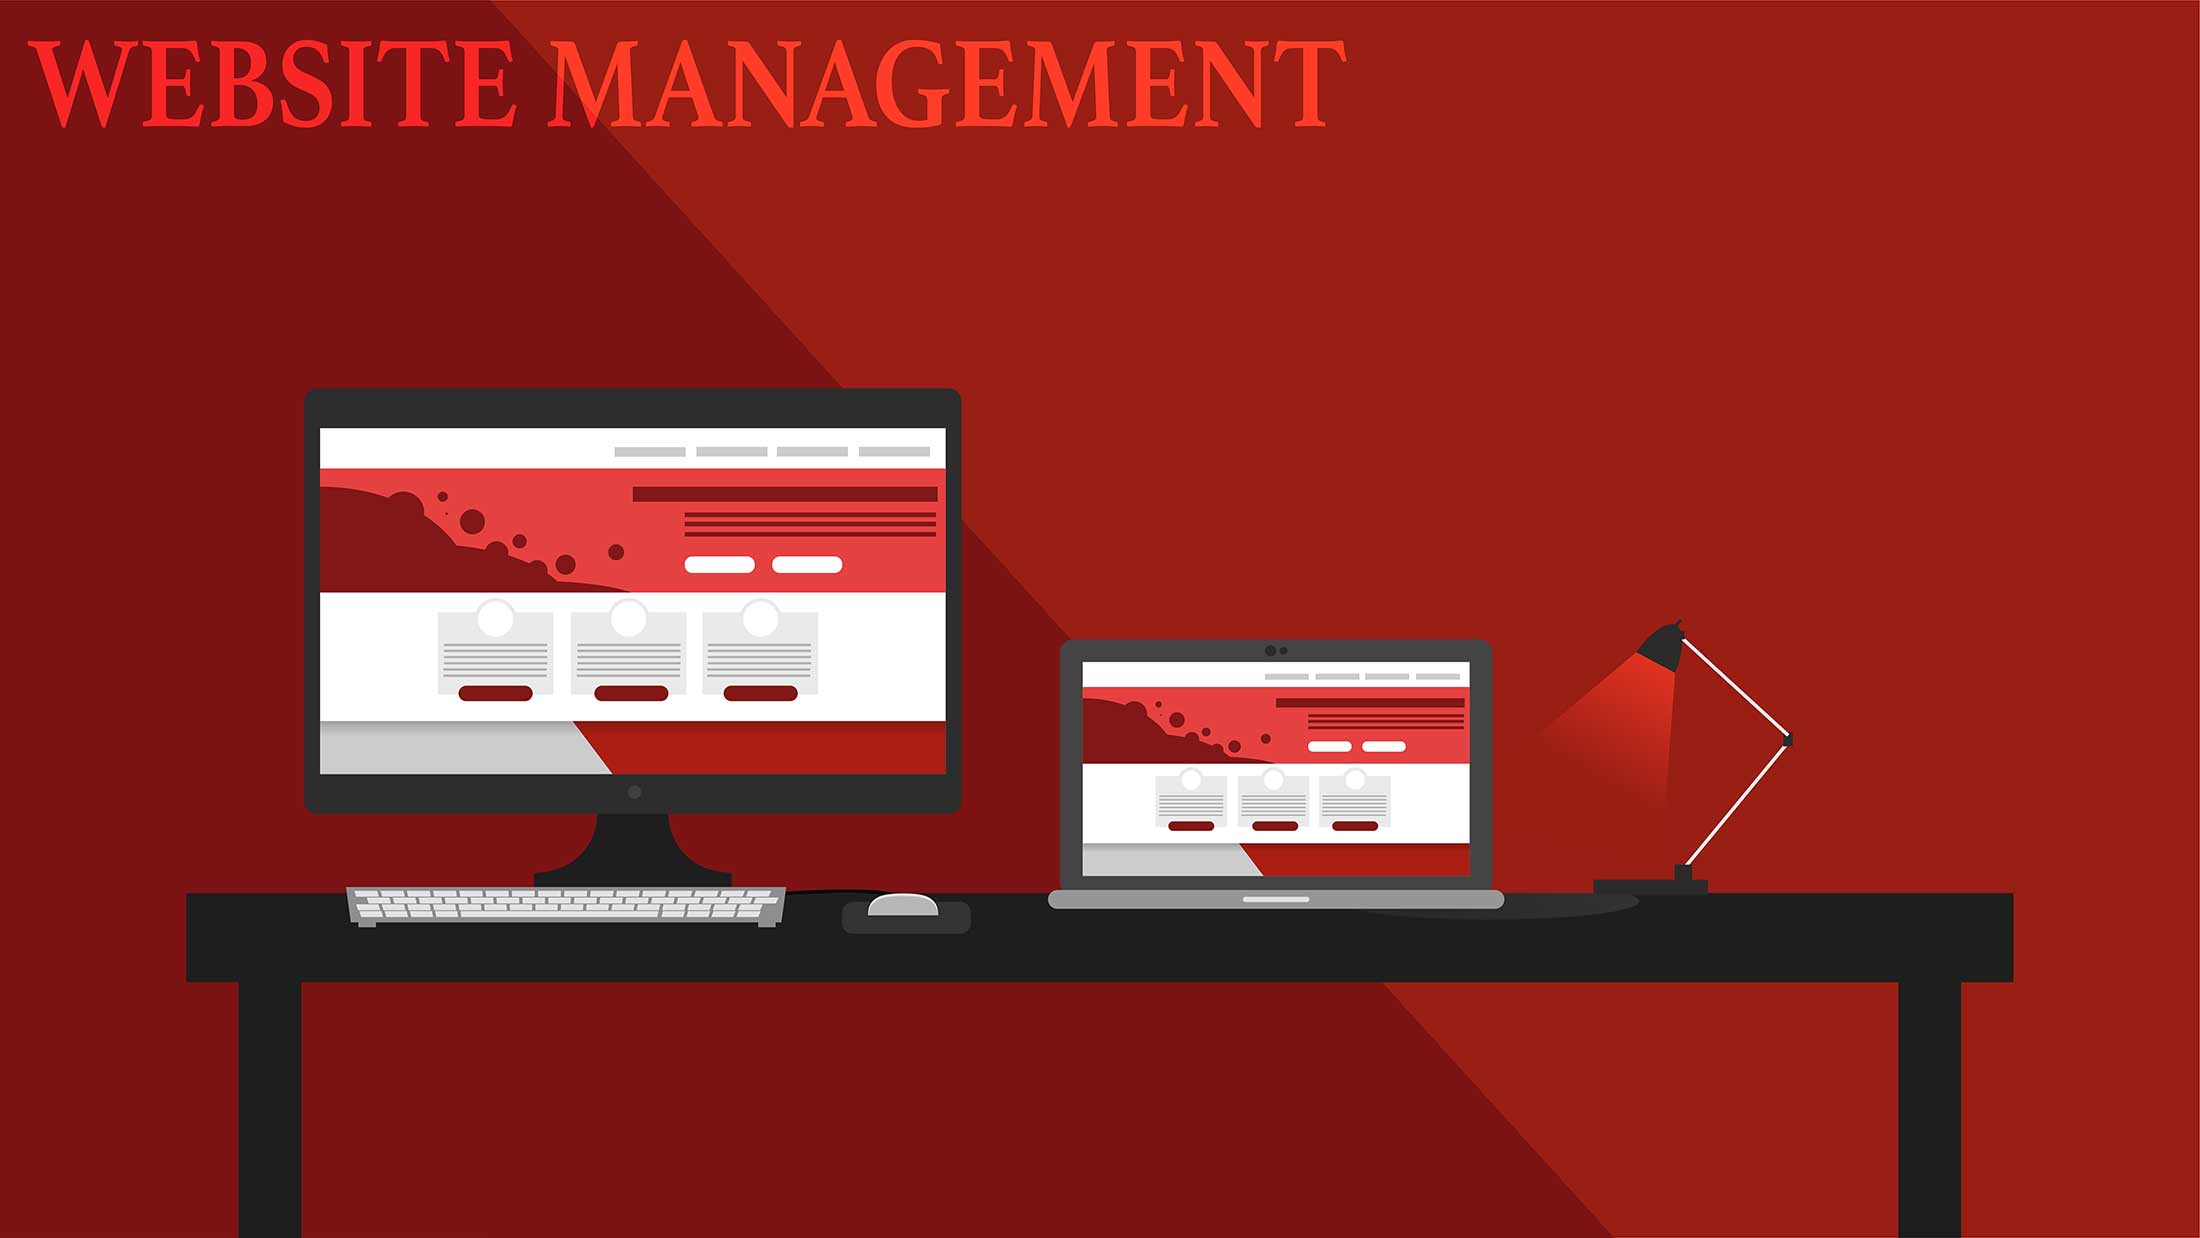 tghe role of website management in rebranding